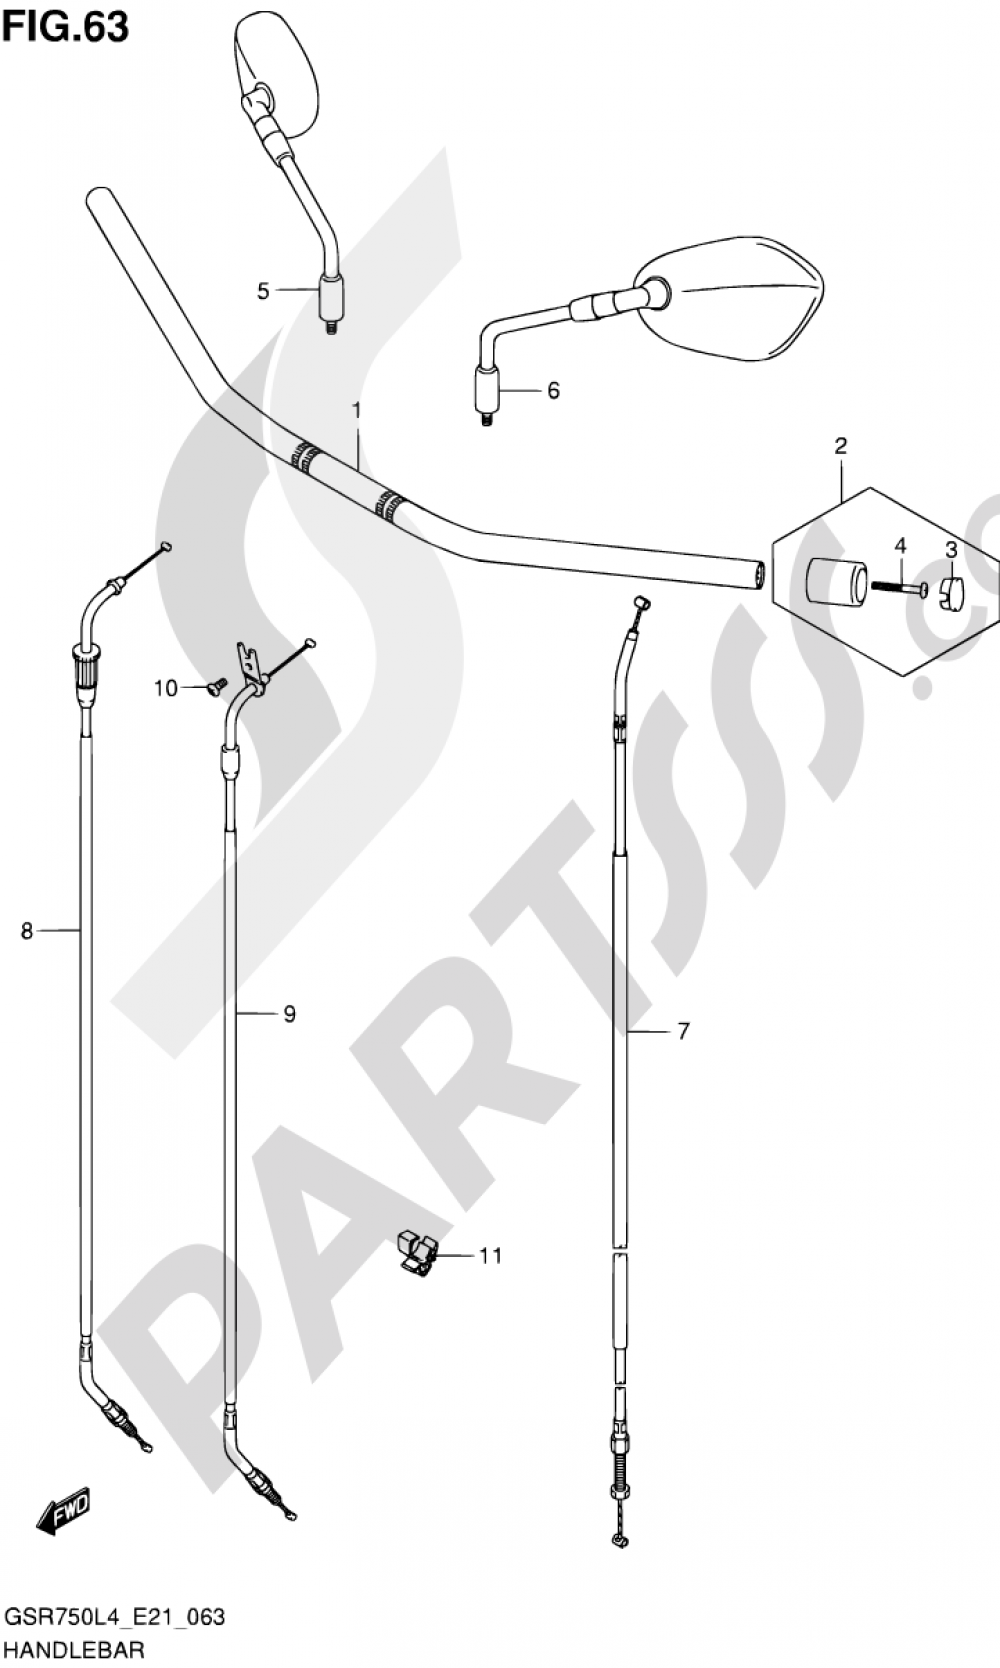 63 - HANDLEBAR Suzuki GSR750 2014